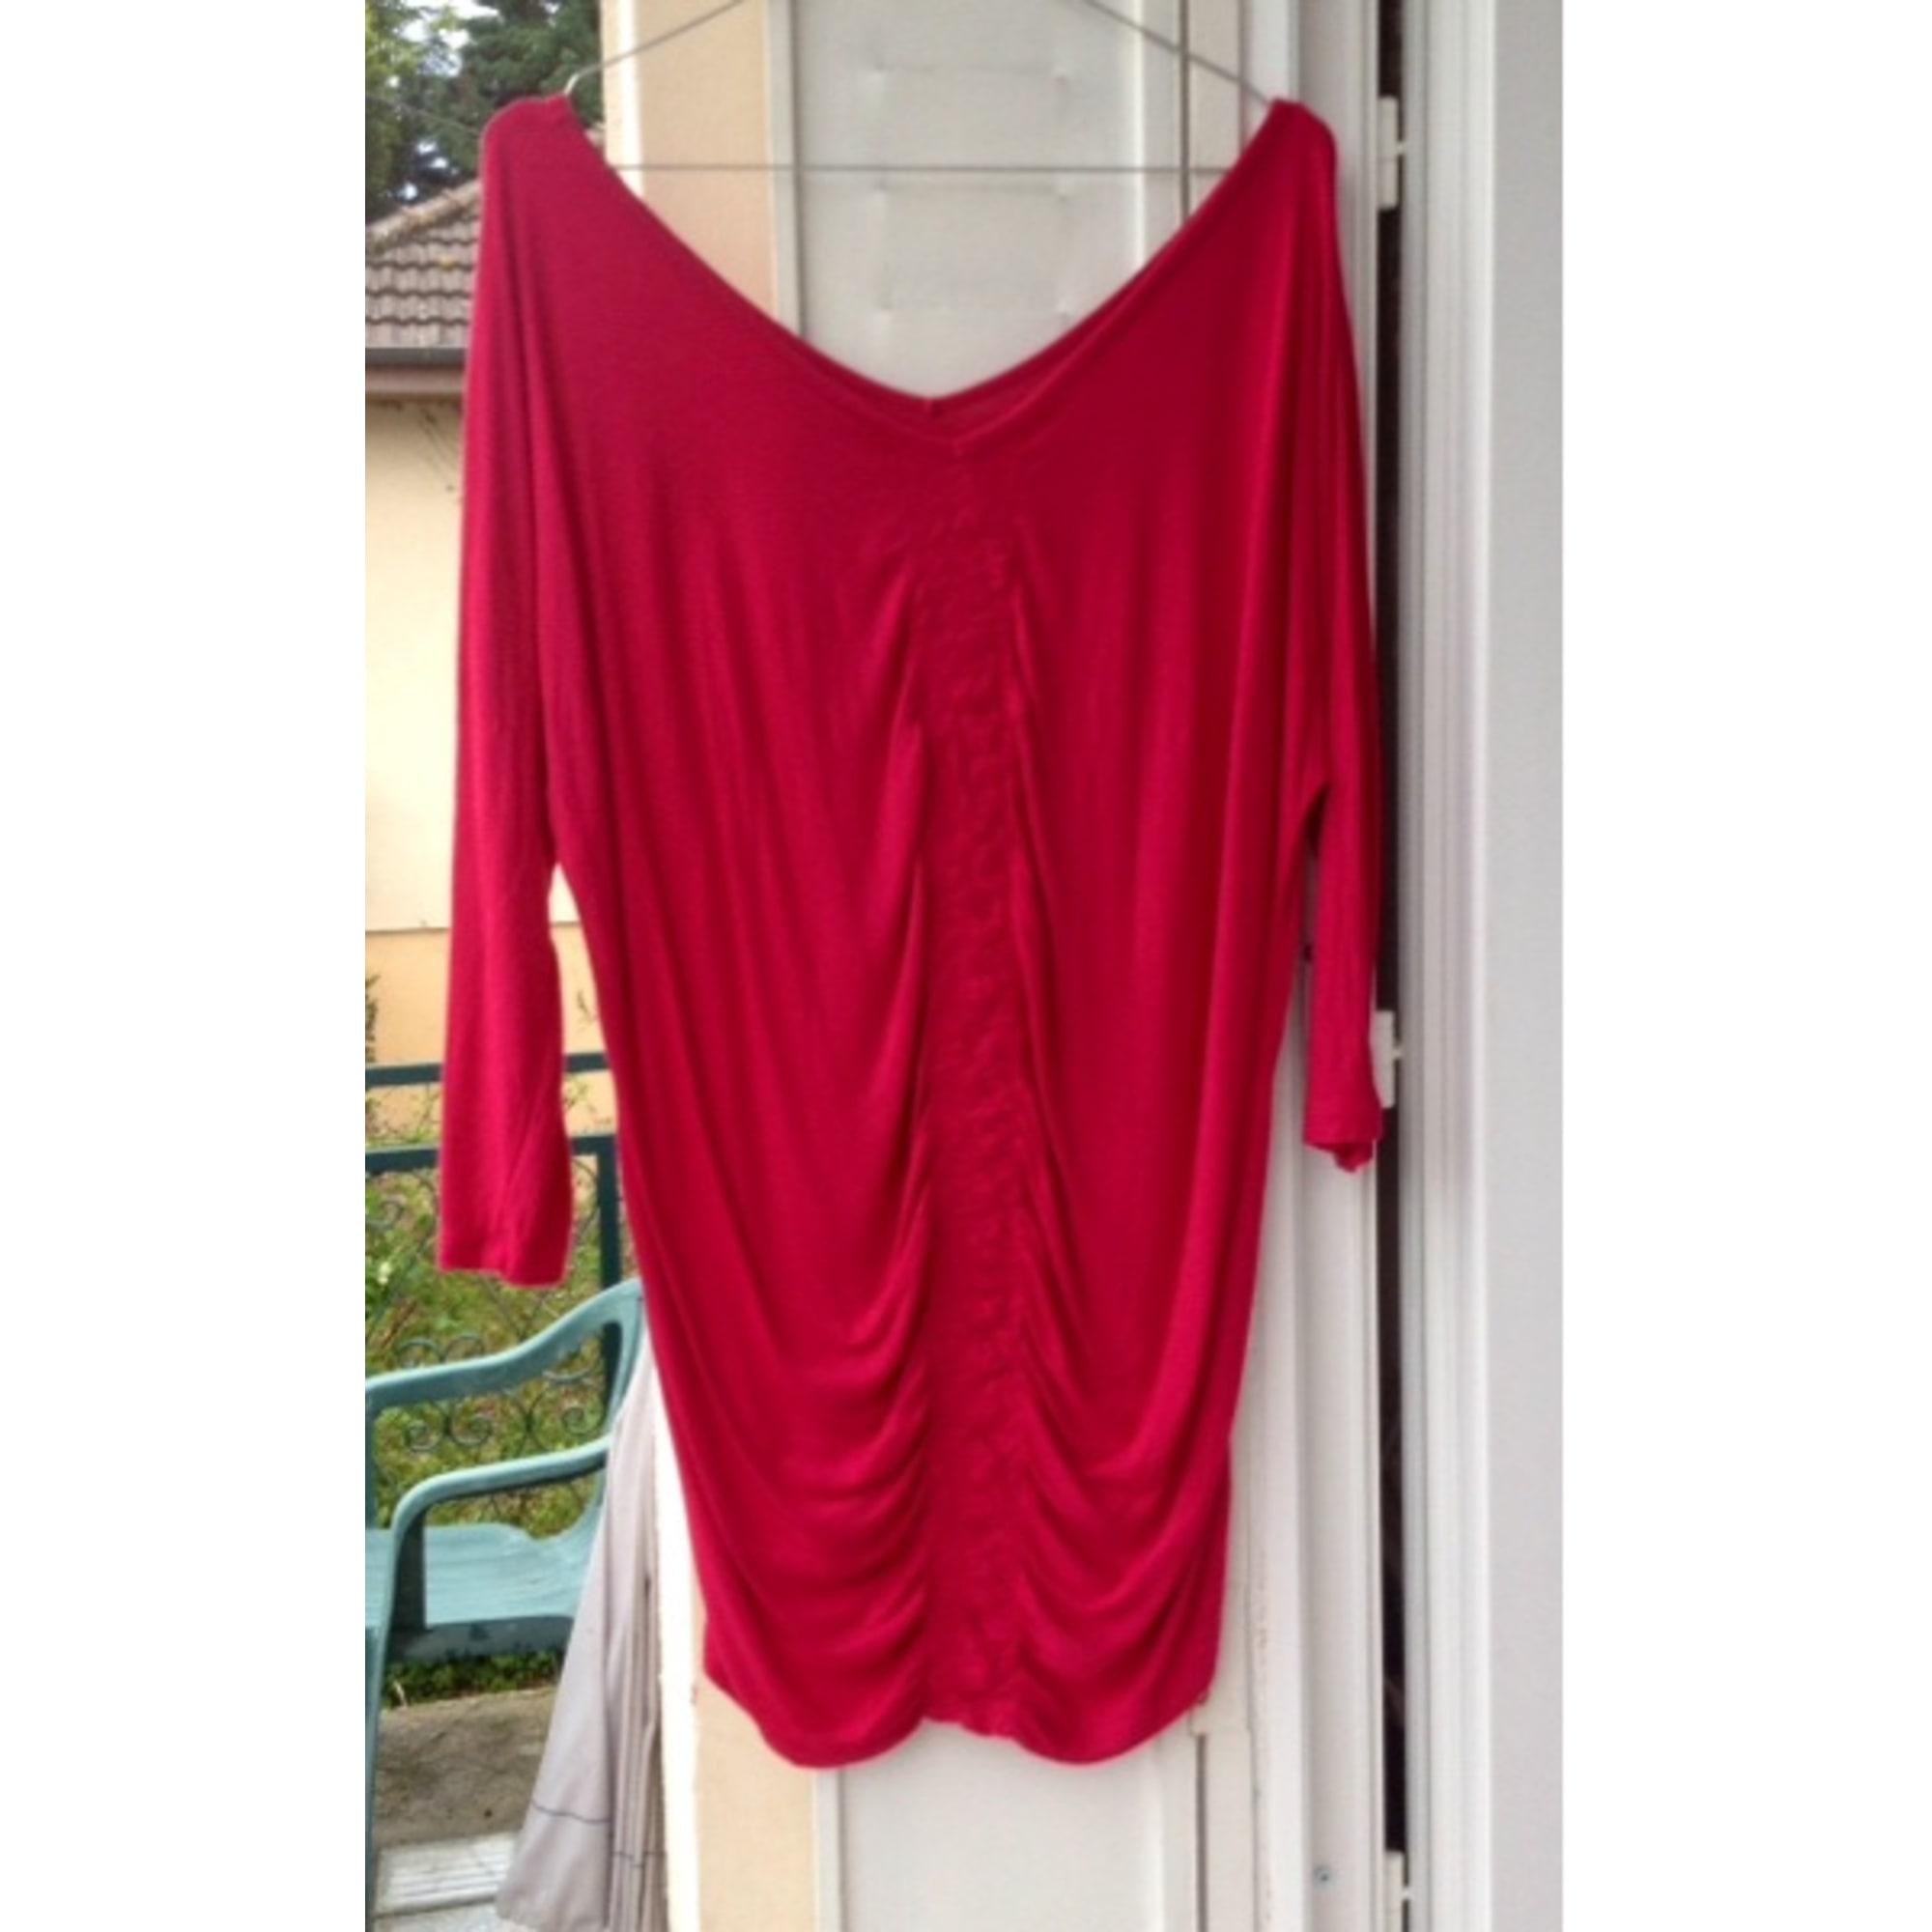 Top, tee-shirt INCONNU Rouge, bordeaux